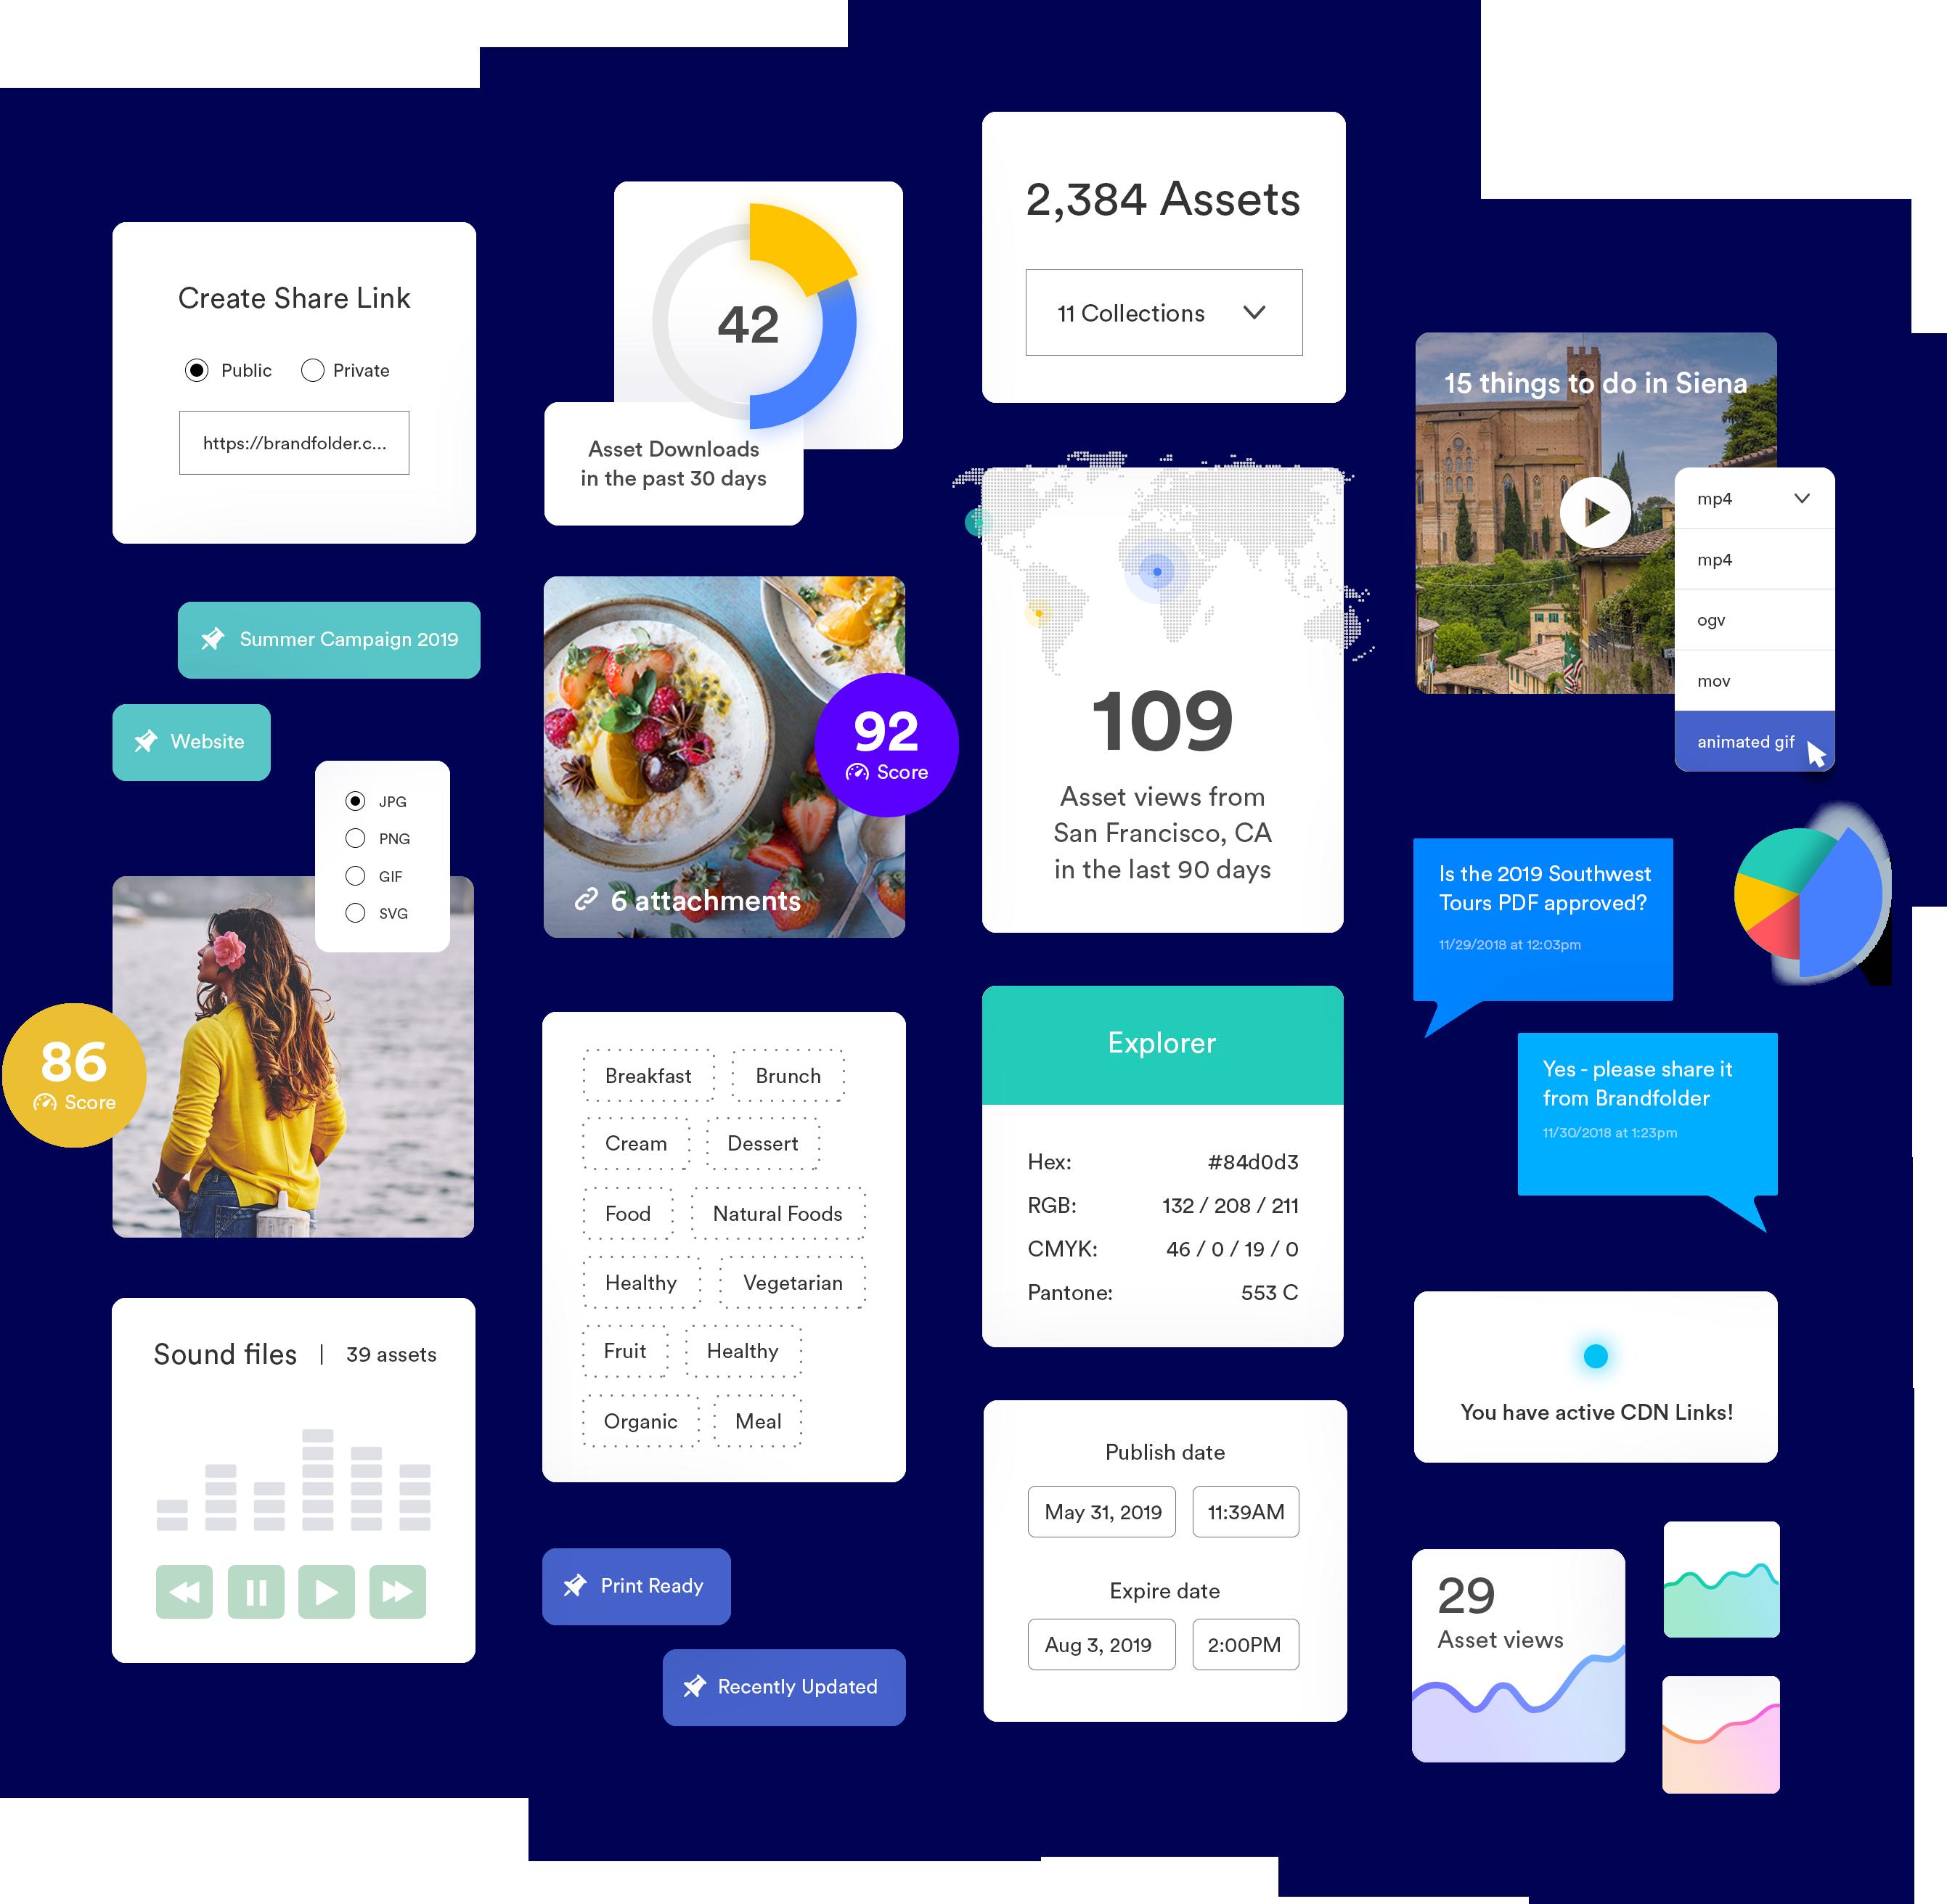 Collage of asset types in Brandfolder